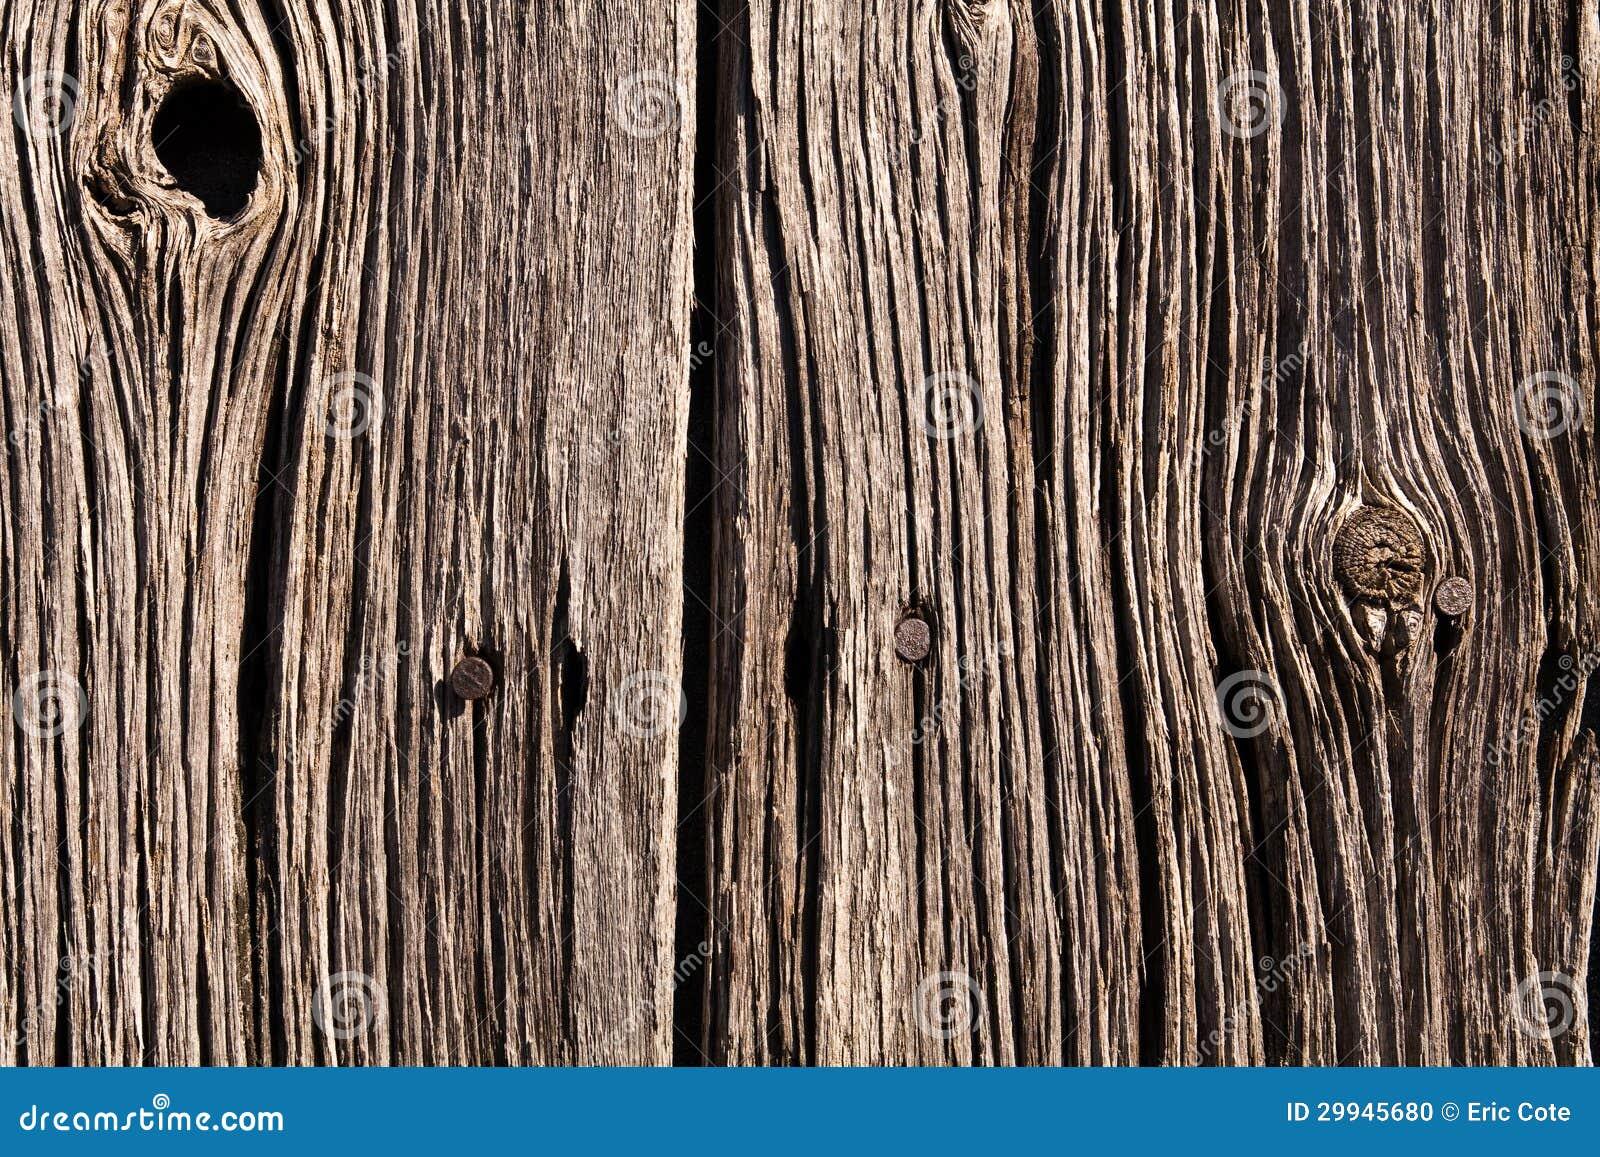 barn wood texture stock photo image of knot, construction 29945680barn wood texture